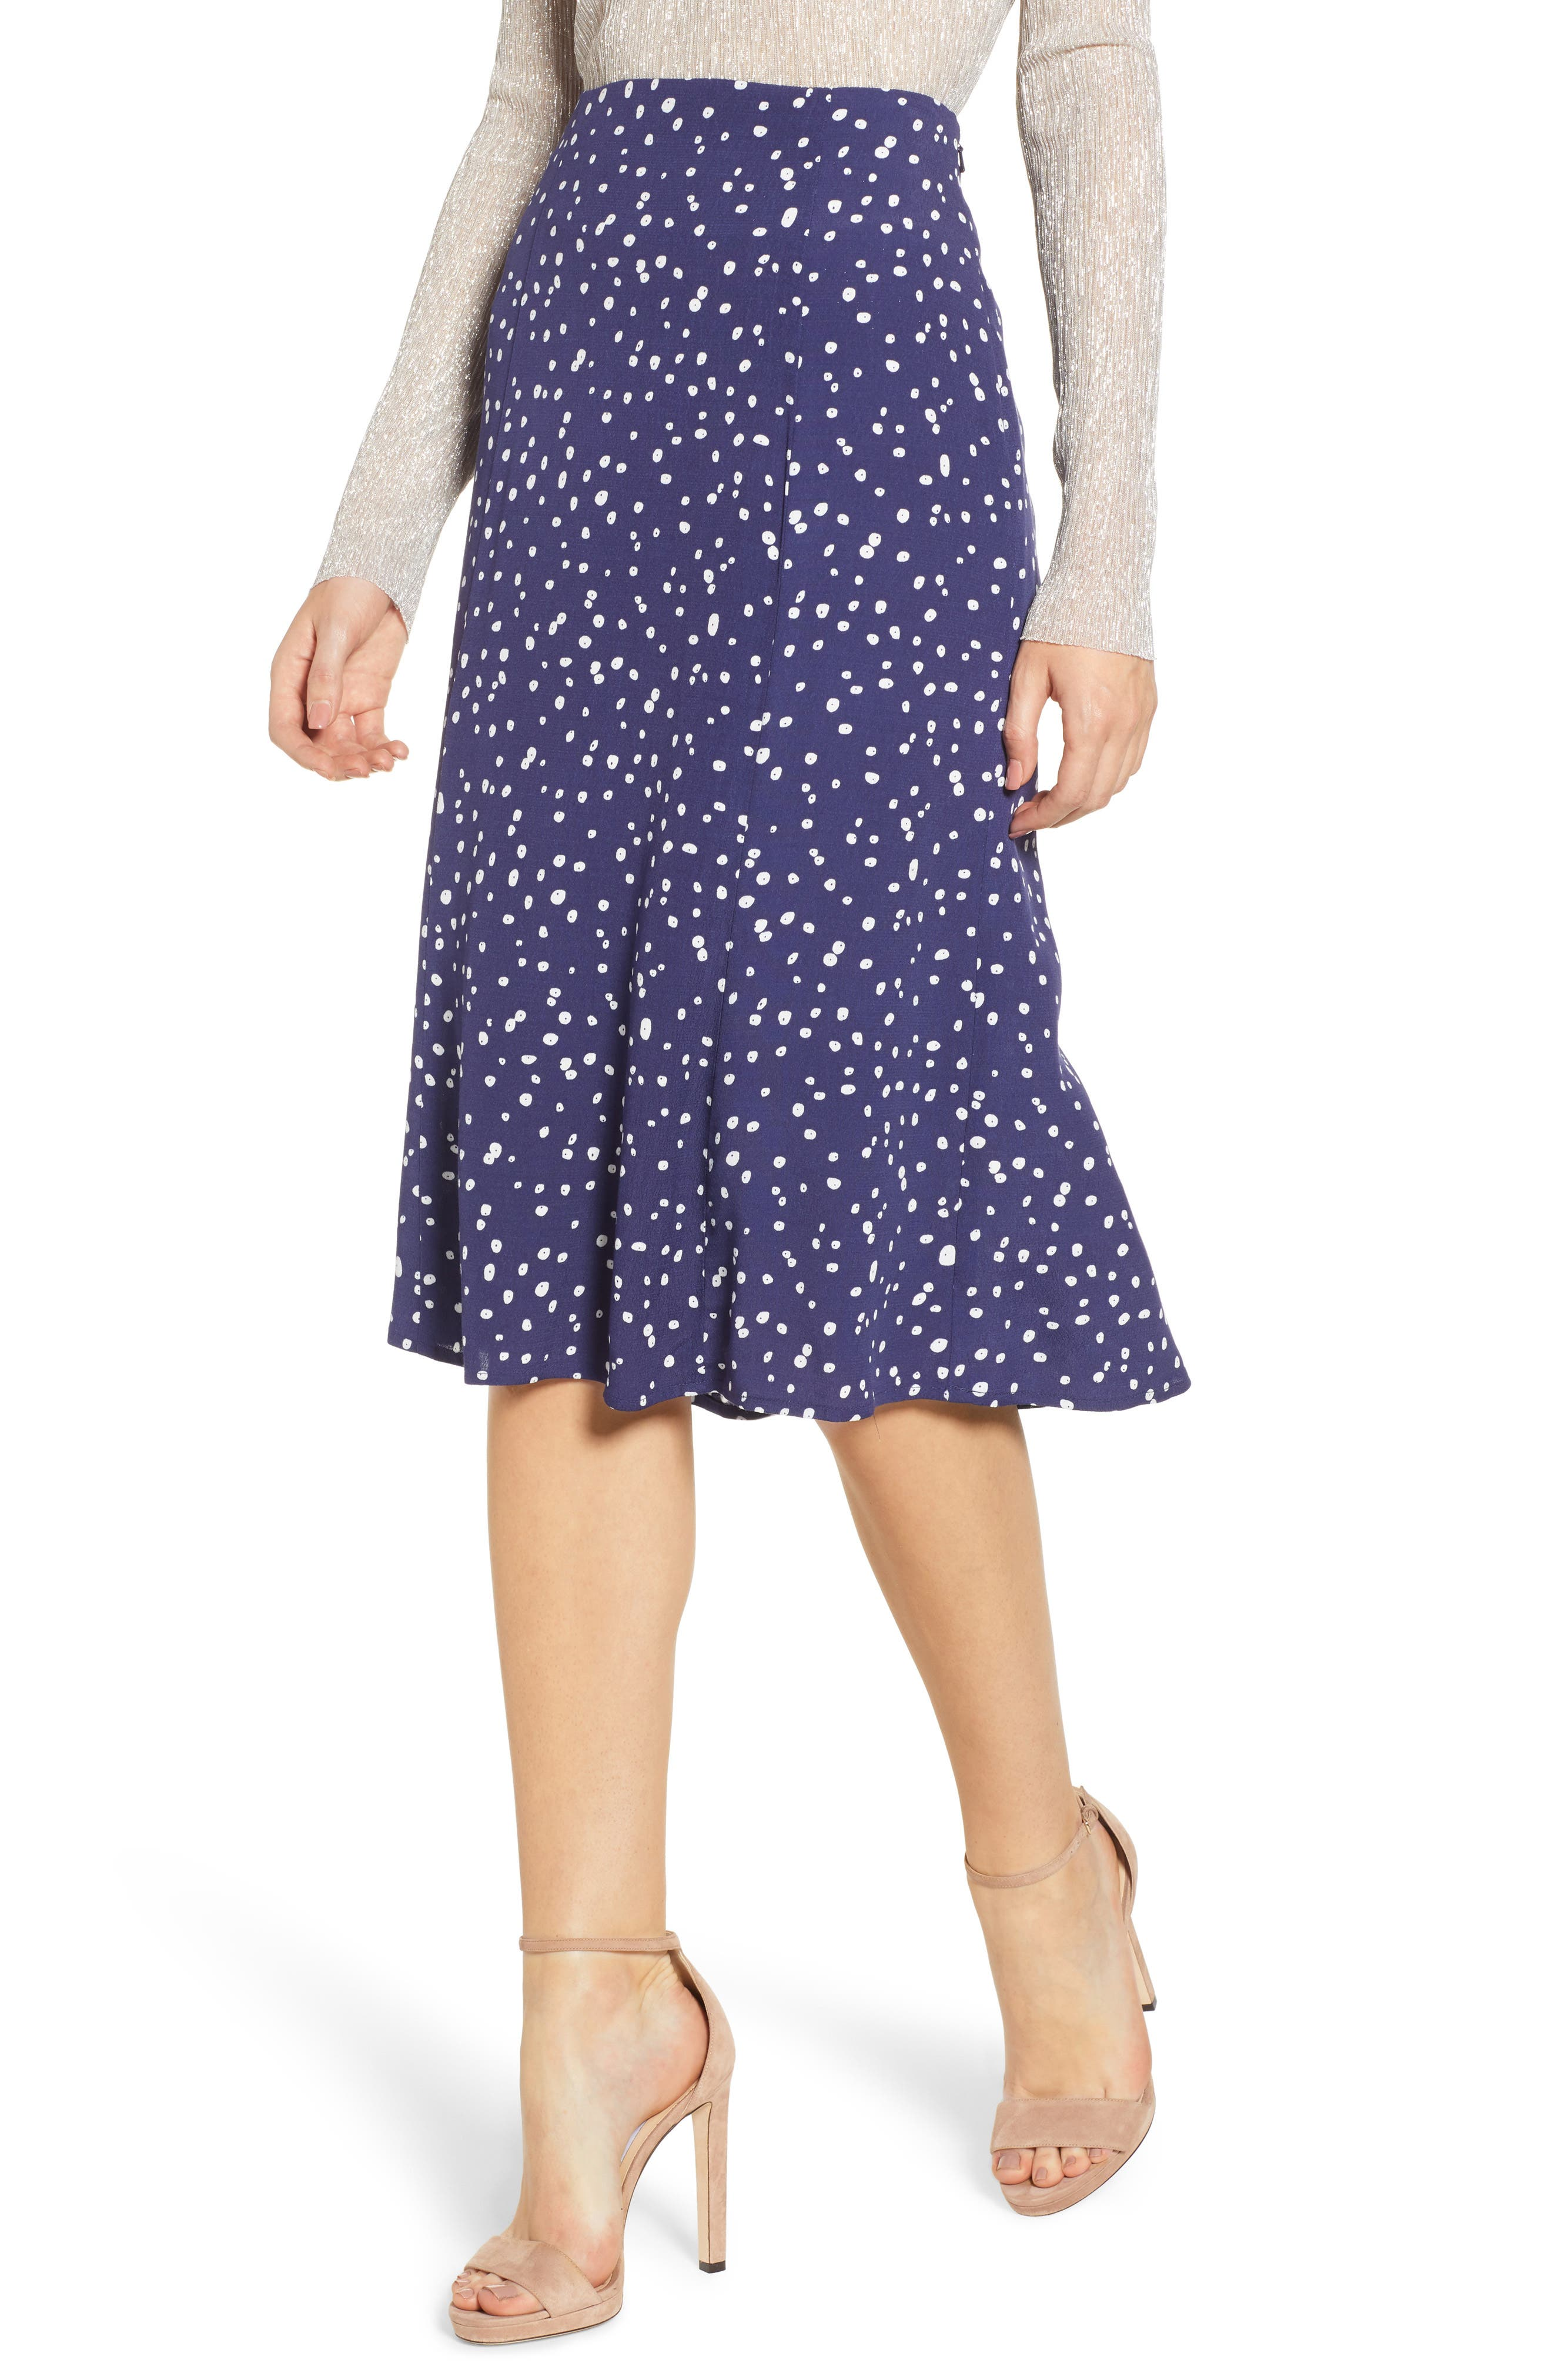 LEITH,                             High Waist Print Midi Skirt,                             Main thumbnail 1, color,                             NAVY PEACOAT BUTTON DOTS